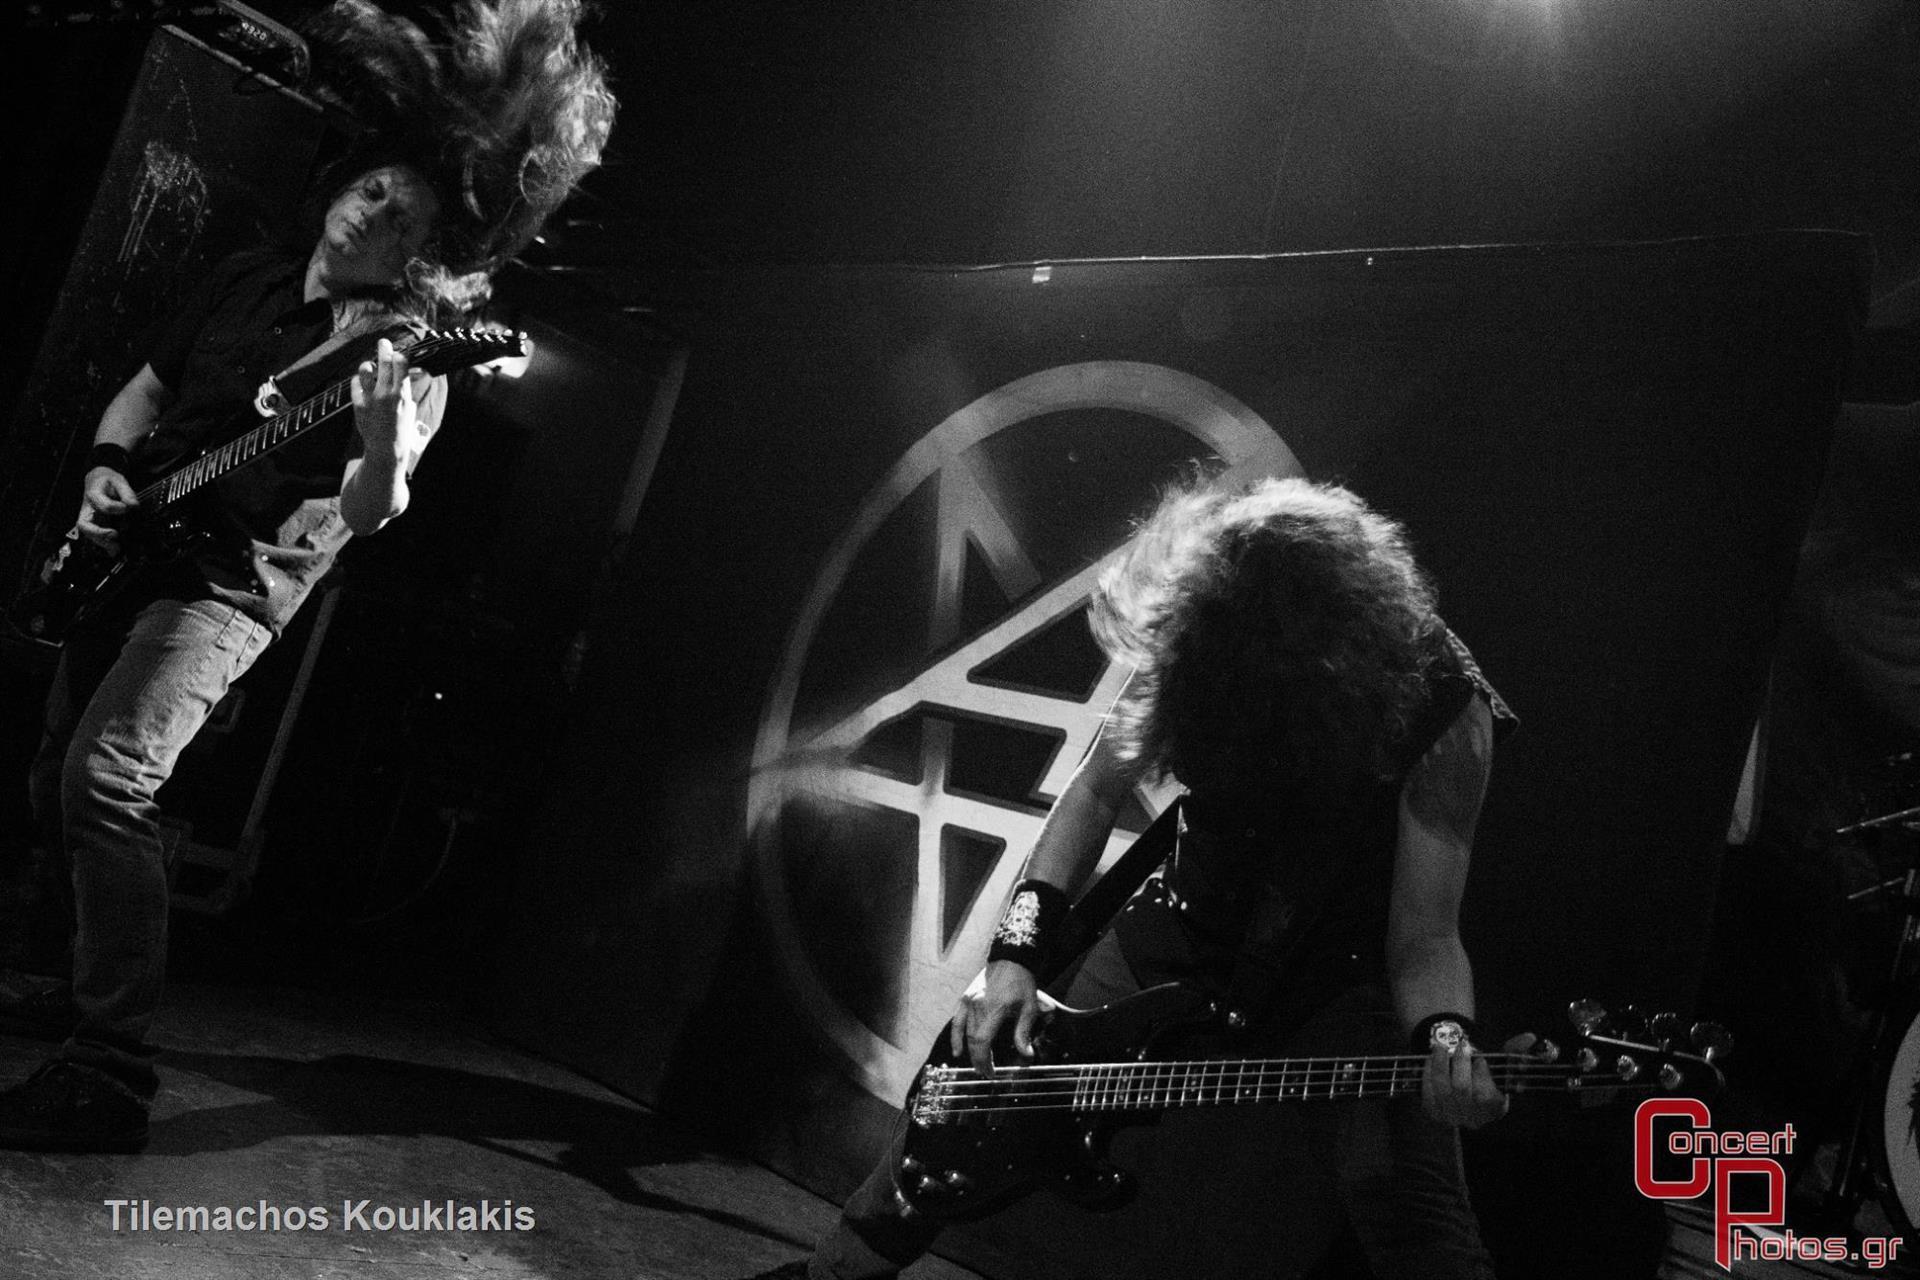 Anthrax-Anthrax photographer: Tilemachos Kouklakis - IMG_1434